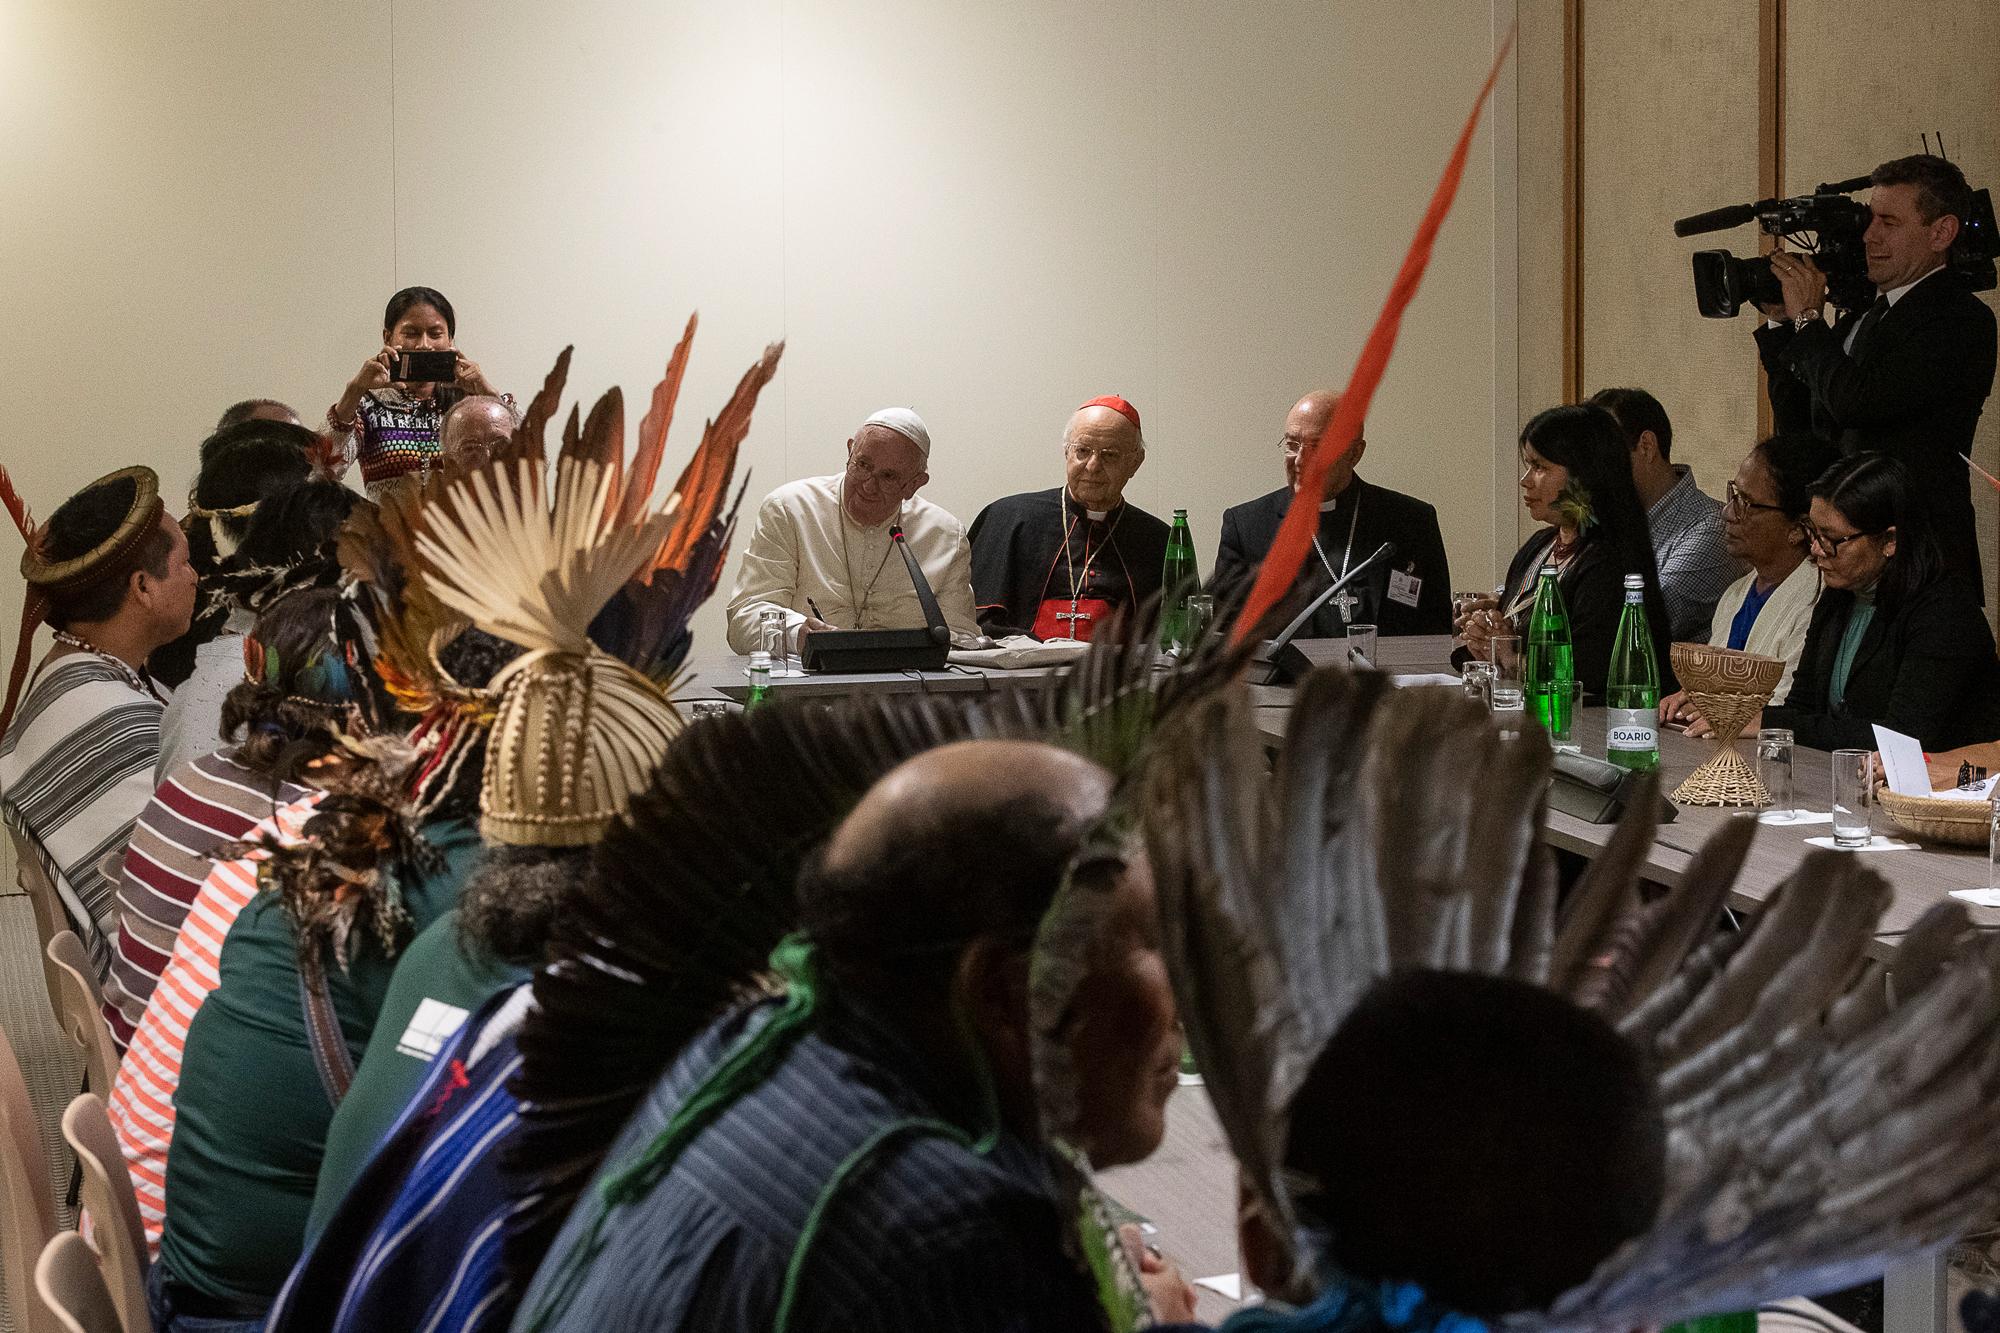 Rencontre avec des indigènes d'Amazonie © Vatican Media